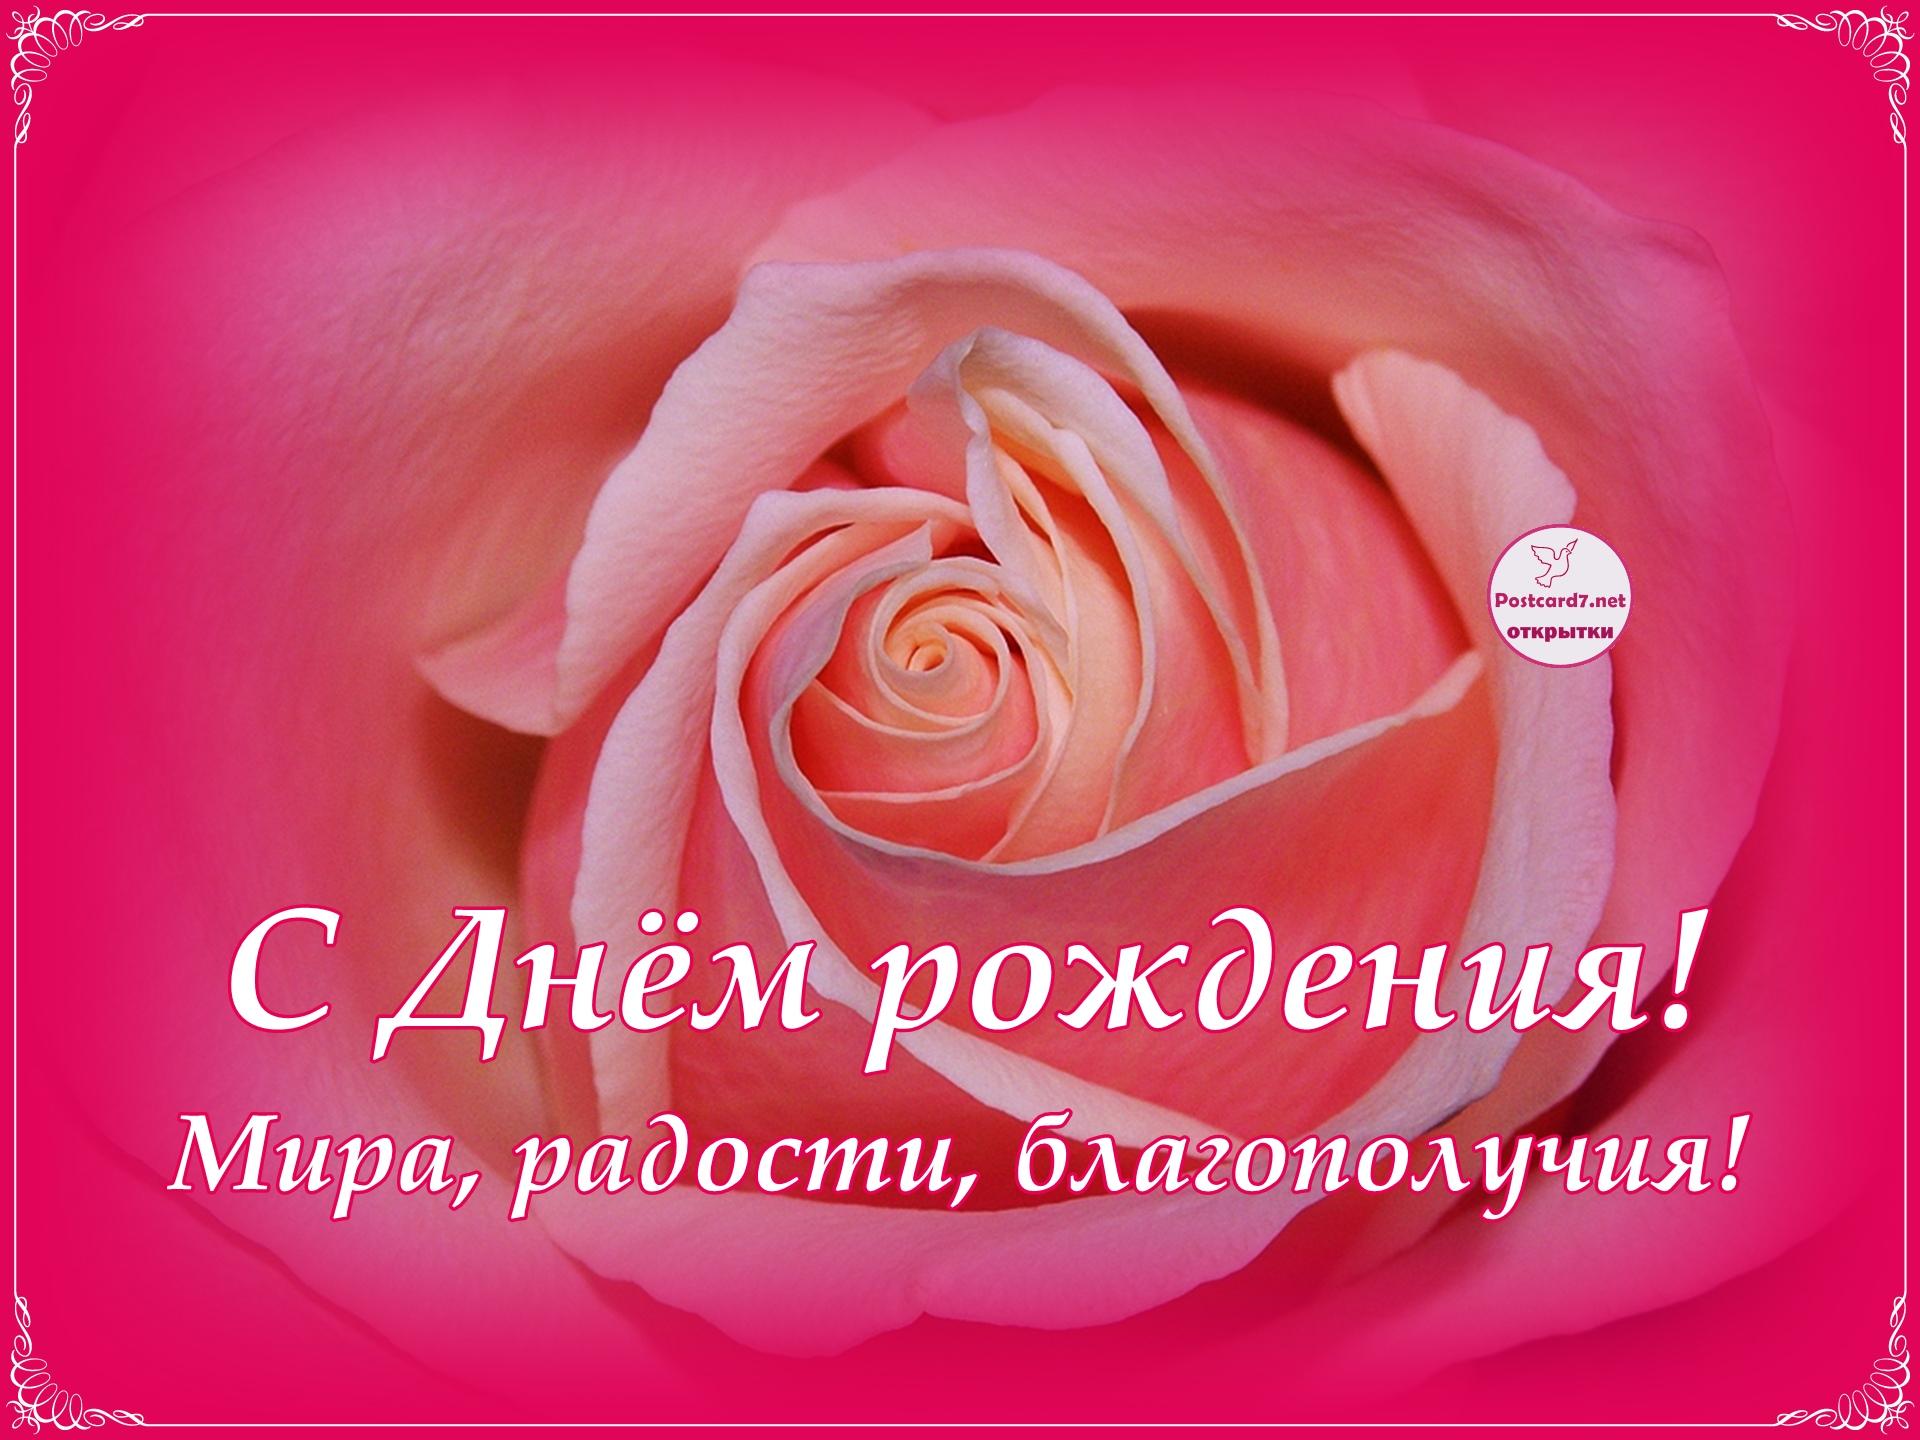 С Днём рождения, роза с пожеланиями